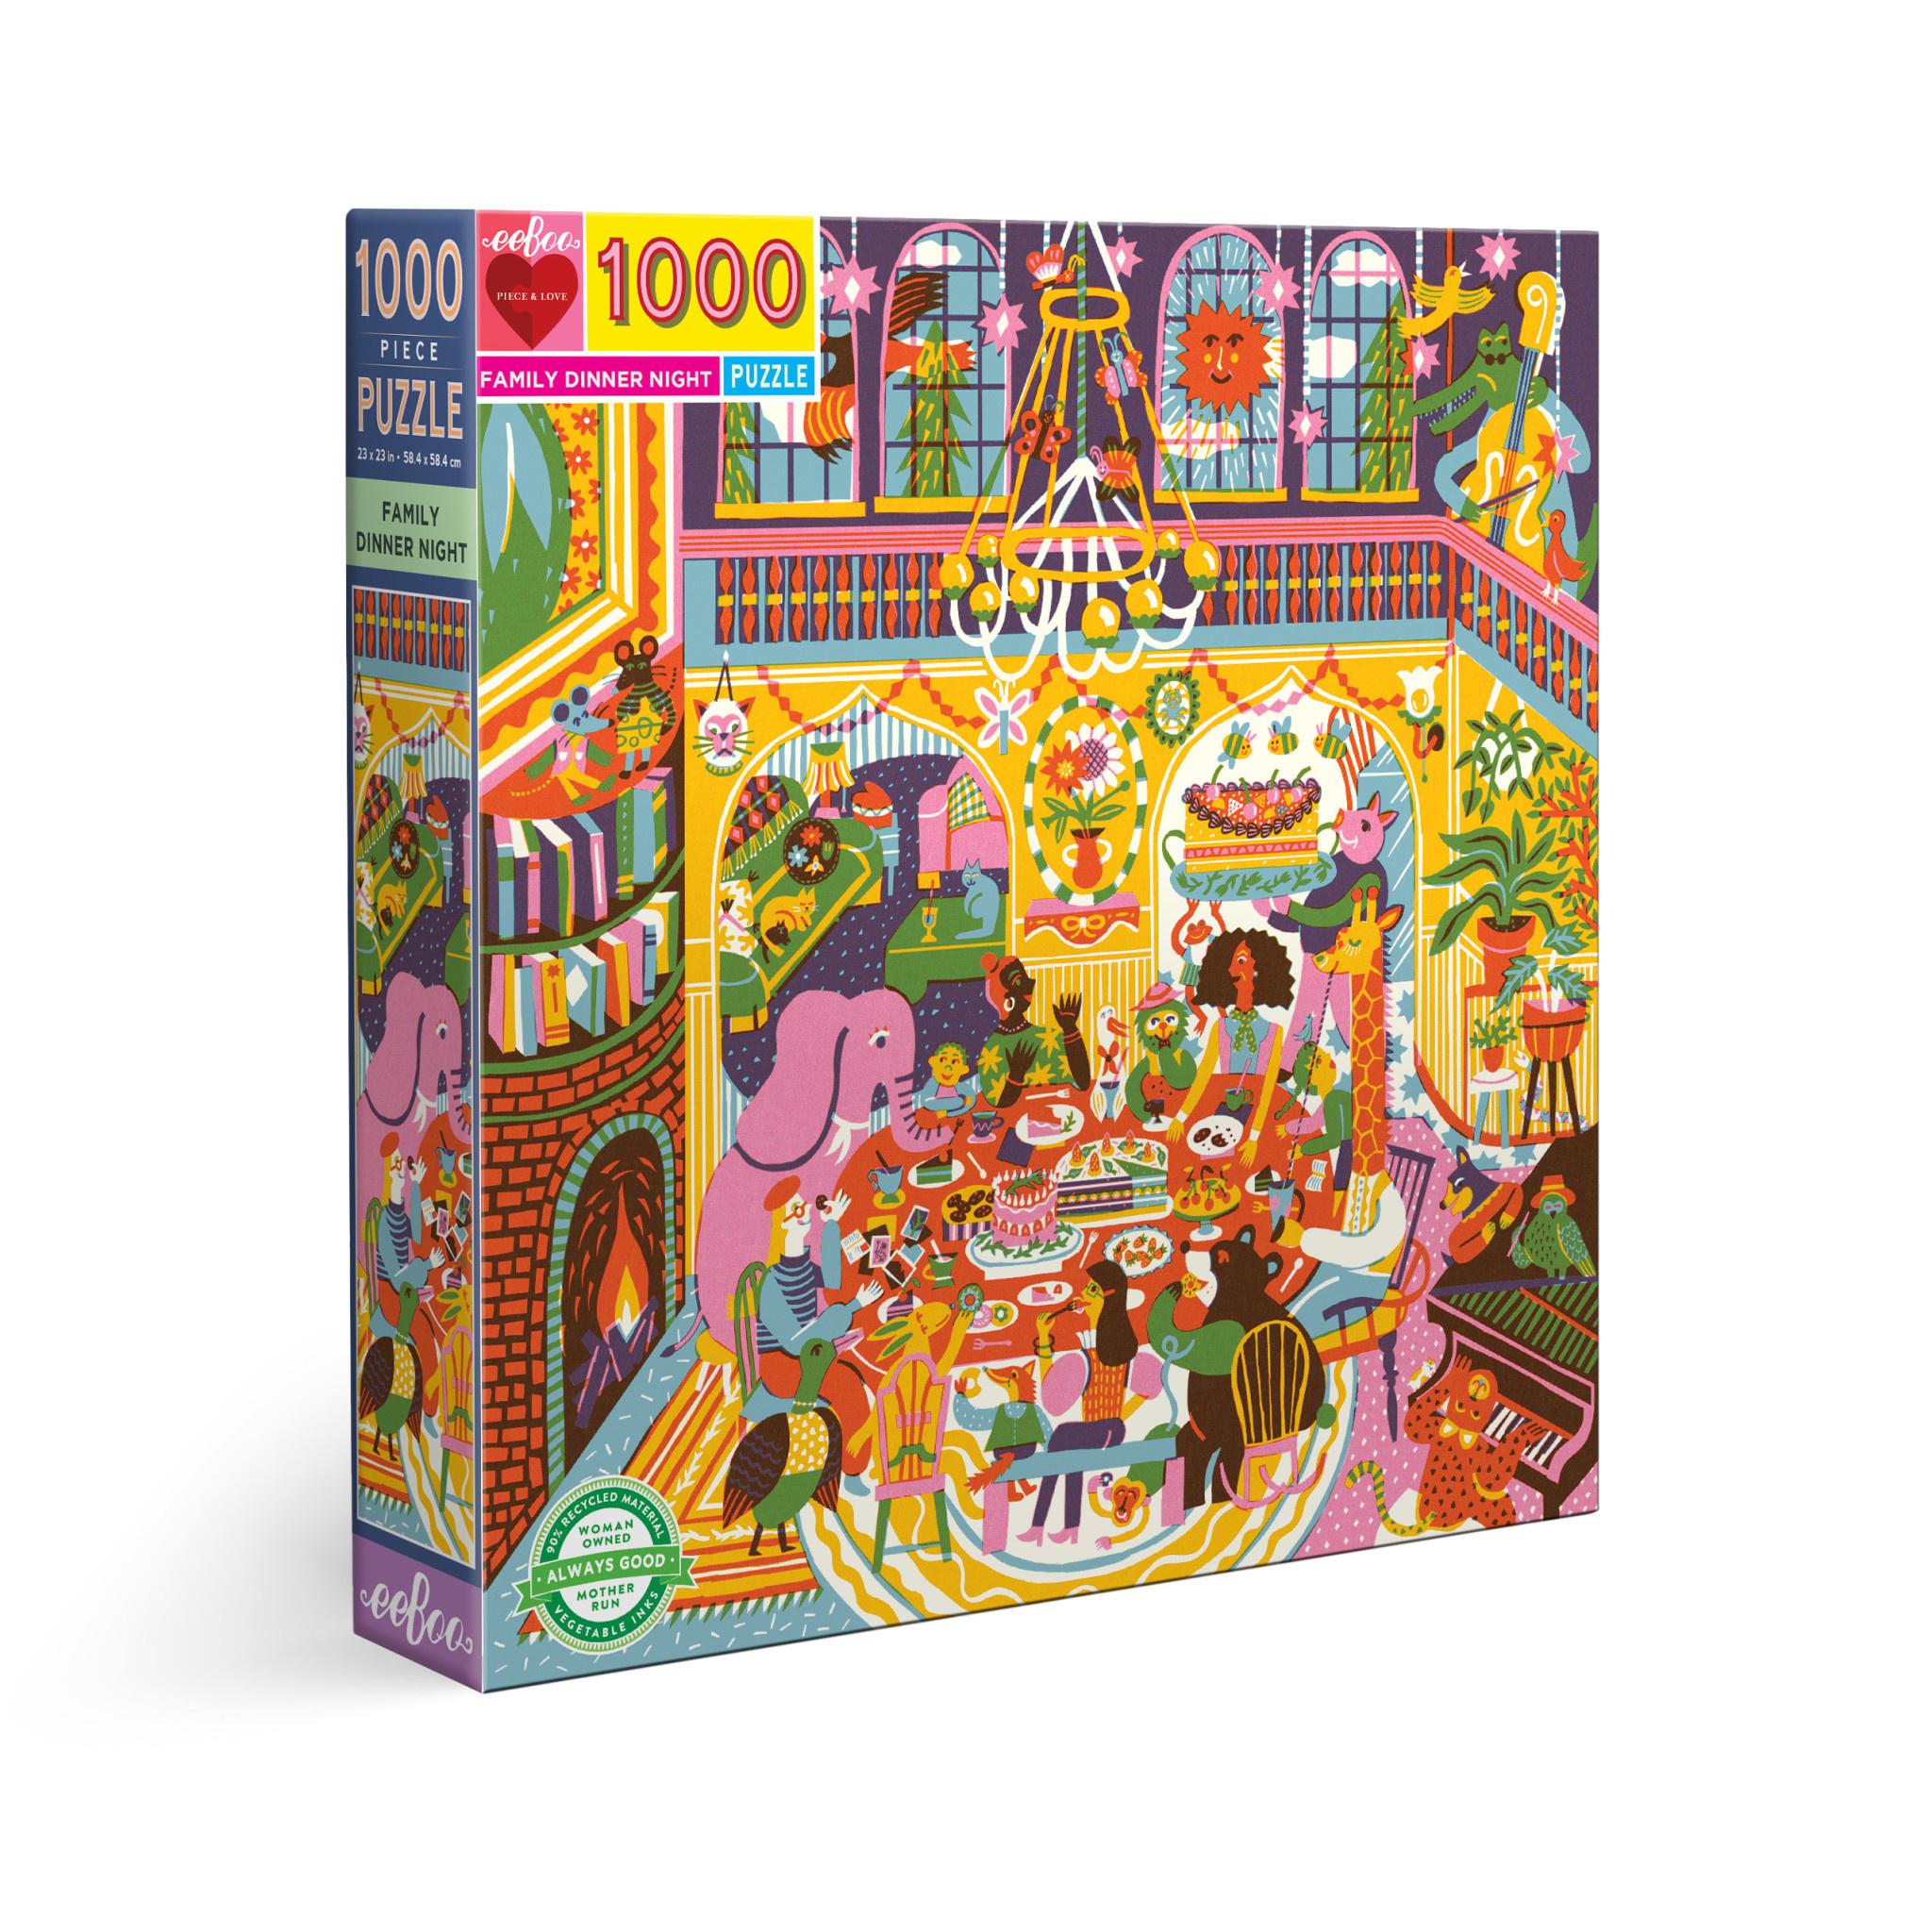 Family Dinner Night (1000 Piece Puzzle)